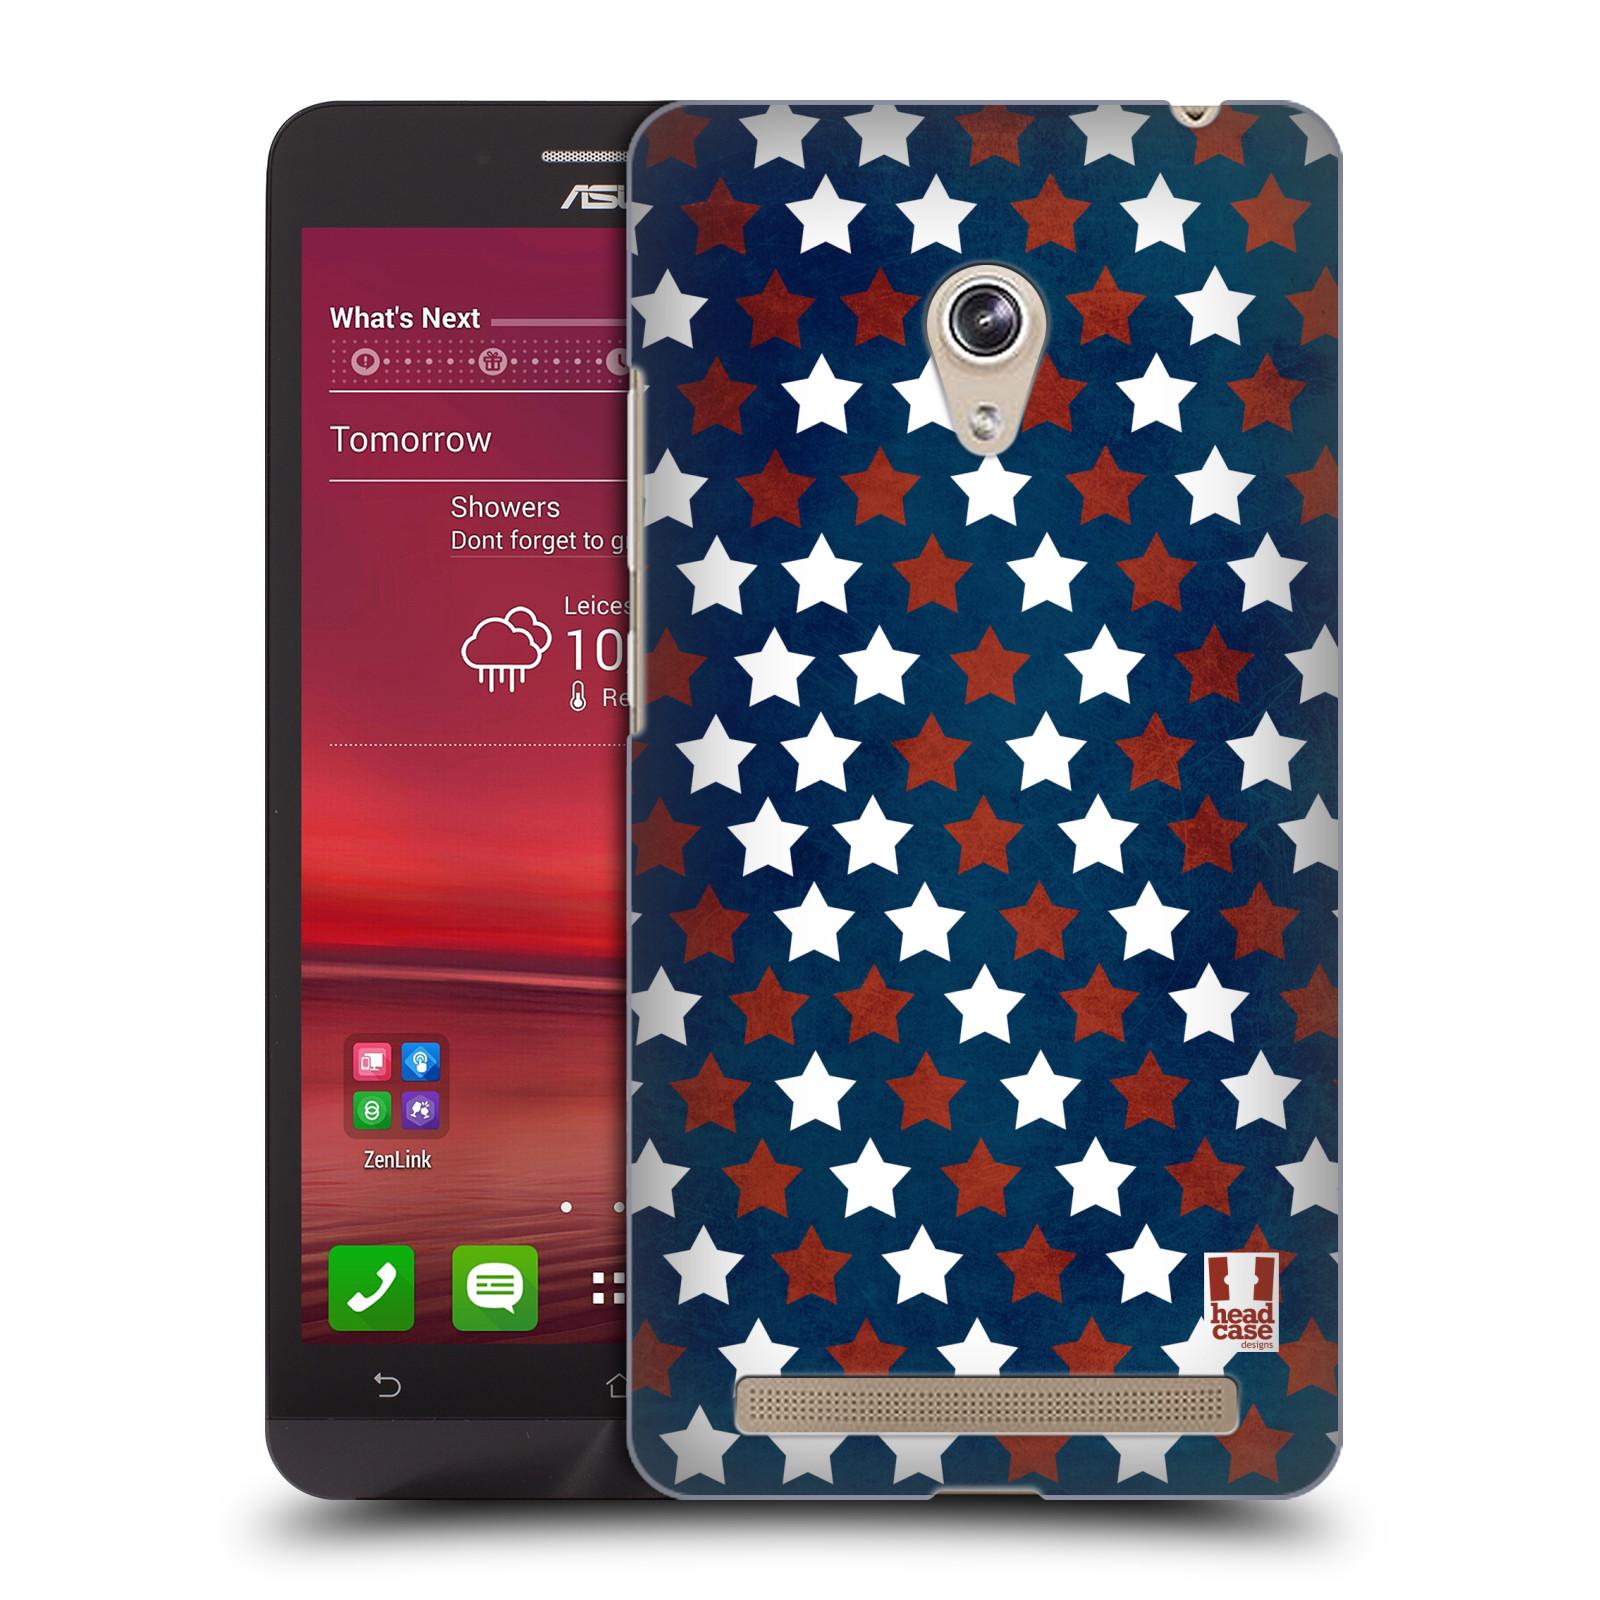 HEAD CASE plastový obal na mobil Asus Zenfone 6 vzor USA VLAJKA HVĚZDY V MODRÉM